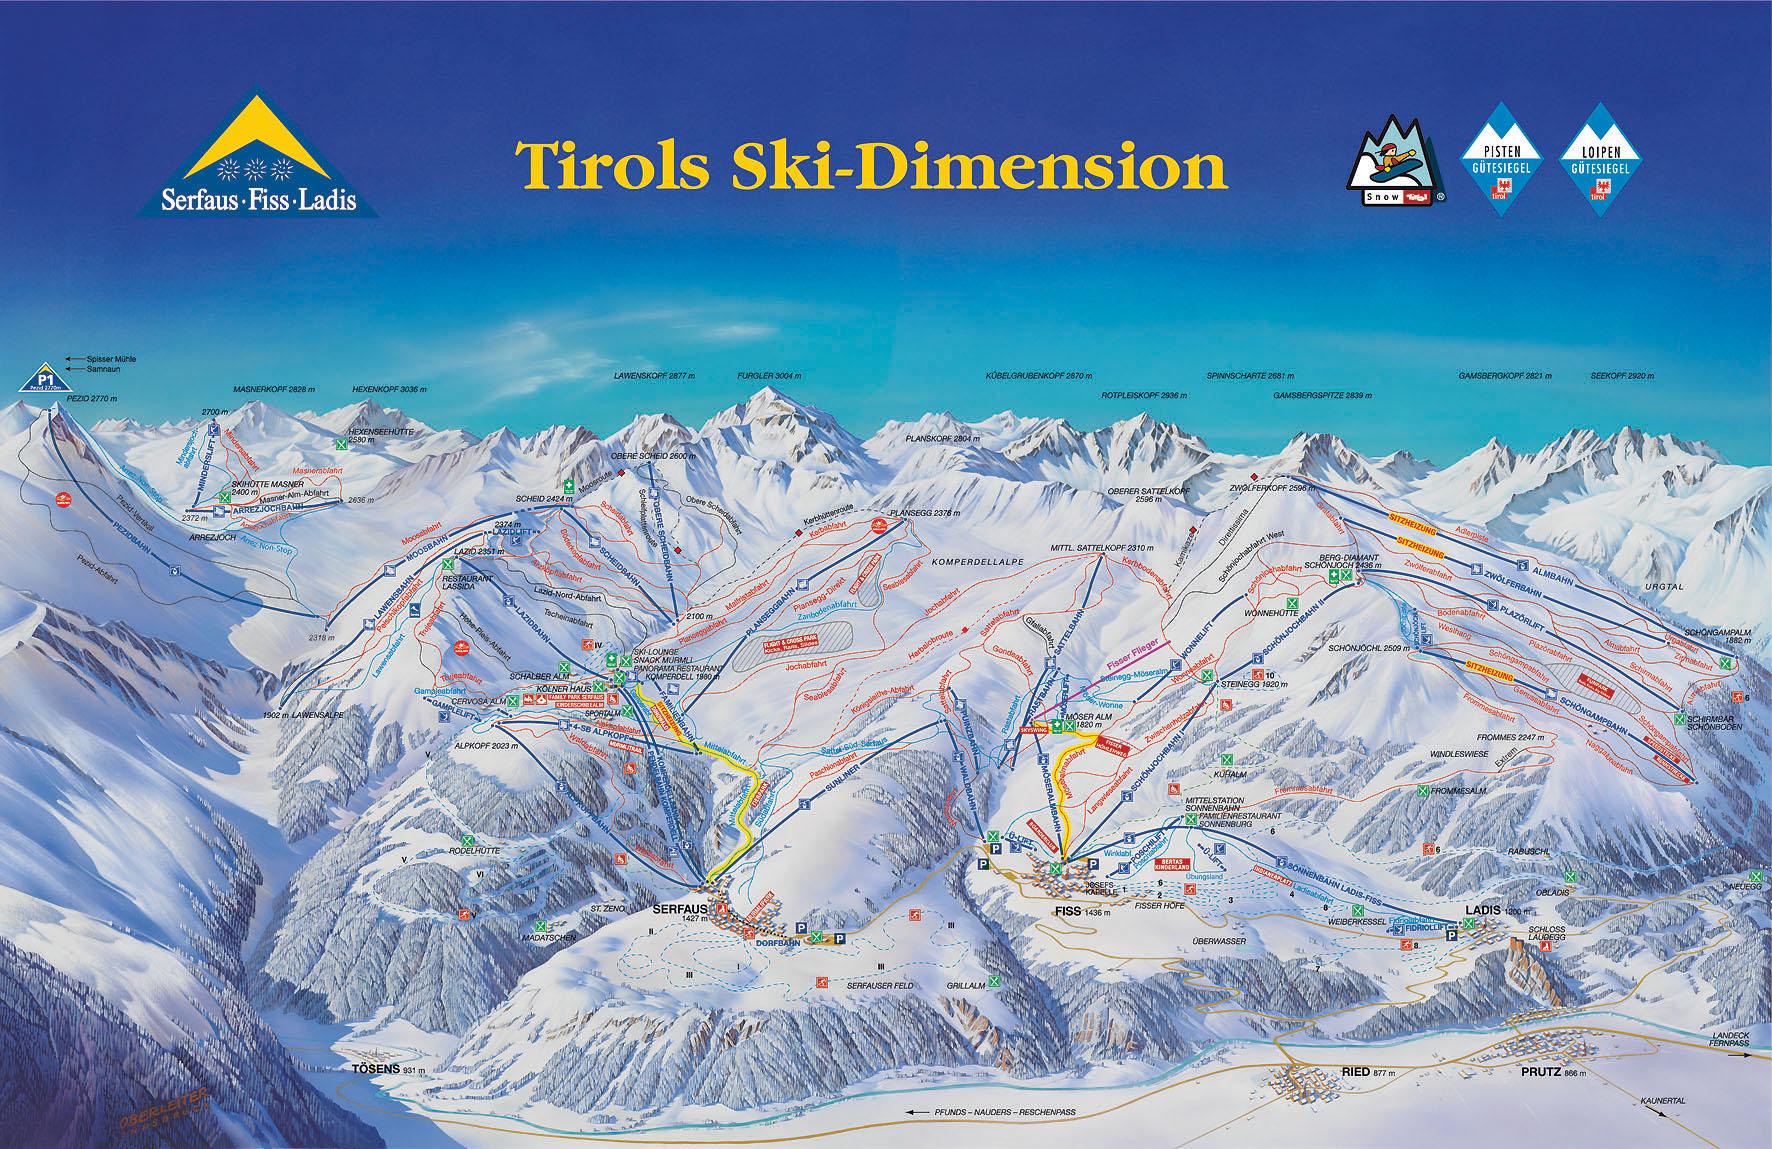 Serfaus-Fiss-Ladis ski mapa